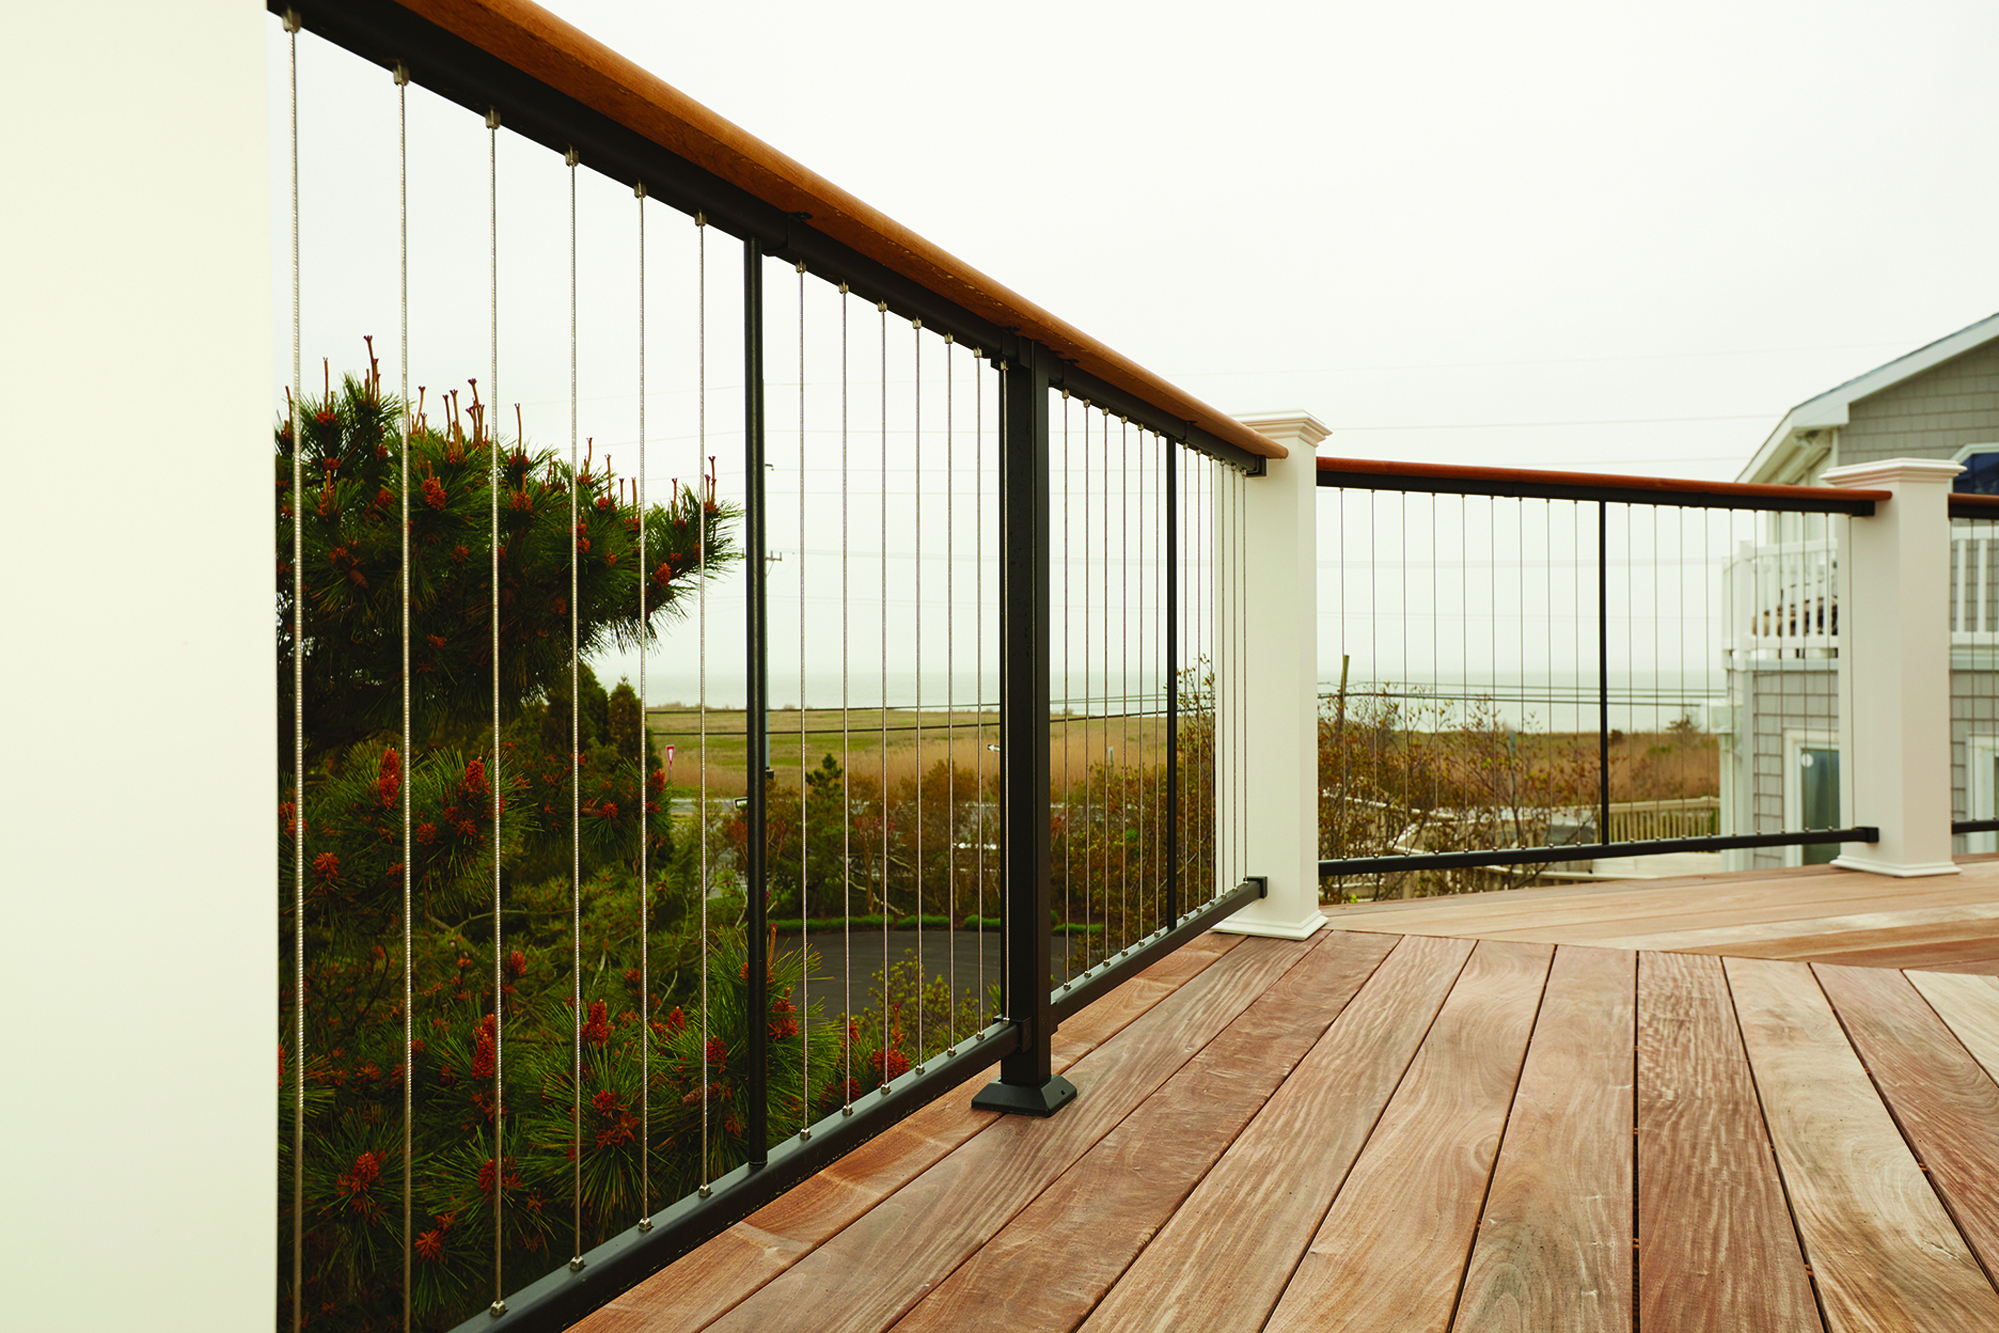 Vertical Cable Rail | Professional Deck Builder | Fencing ...